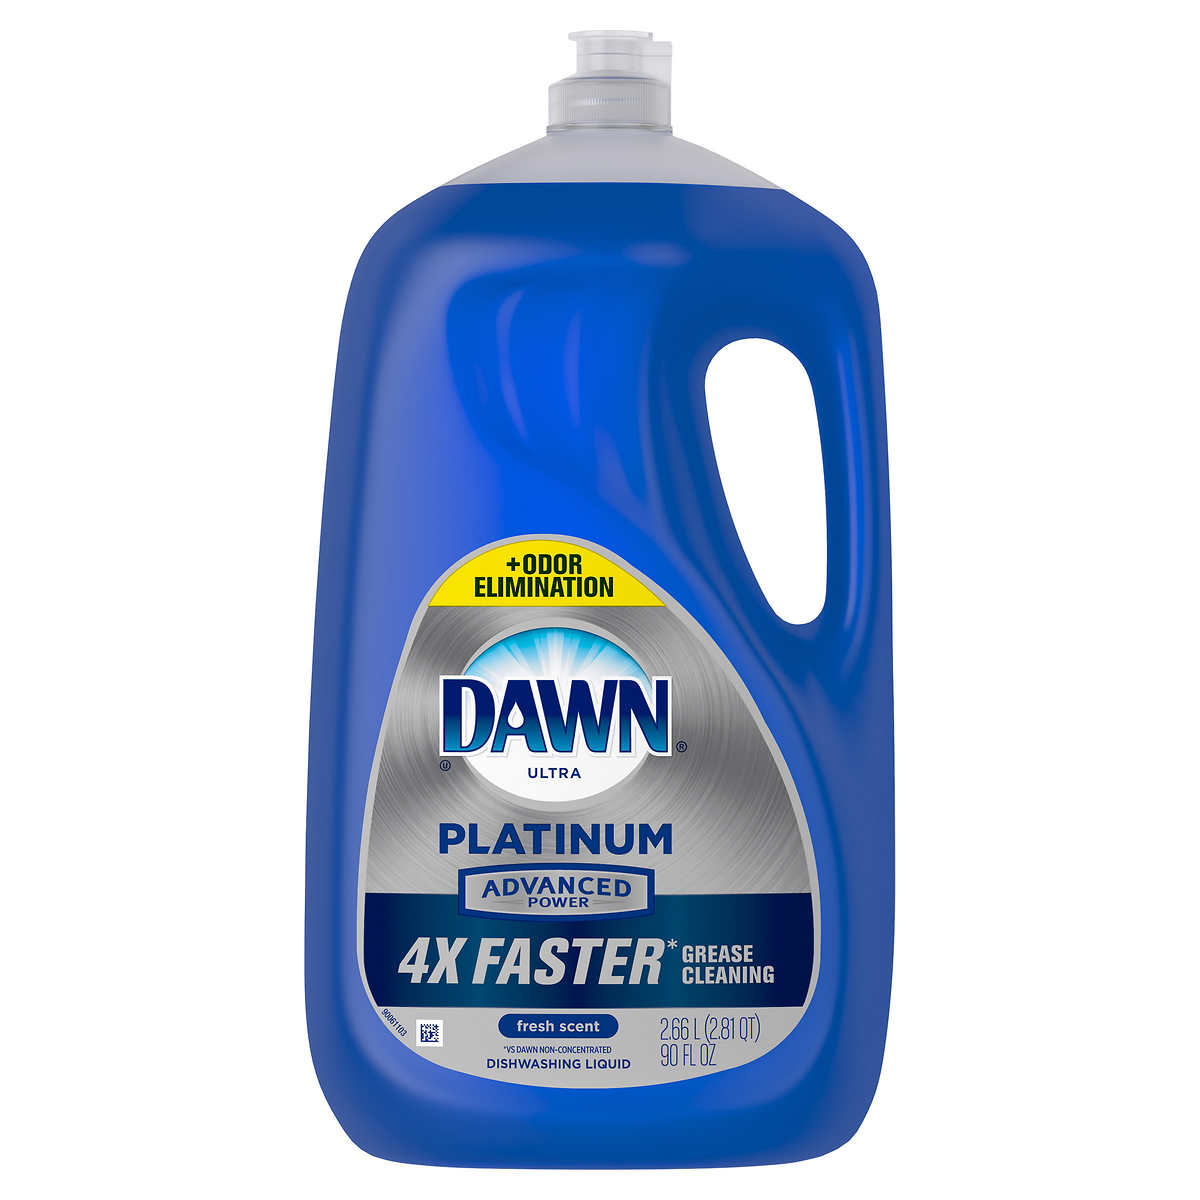 Dawn Platinum Advanced Power Liquid Dish Soap 90 Fl Oz Costco